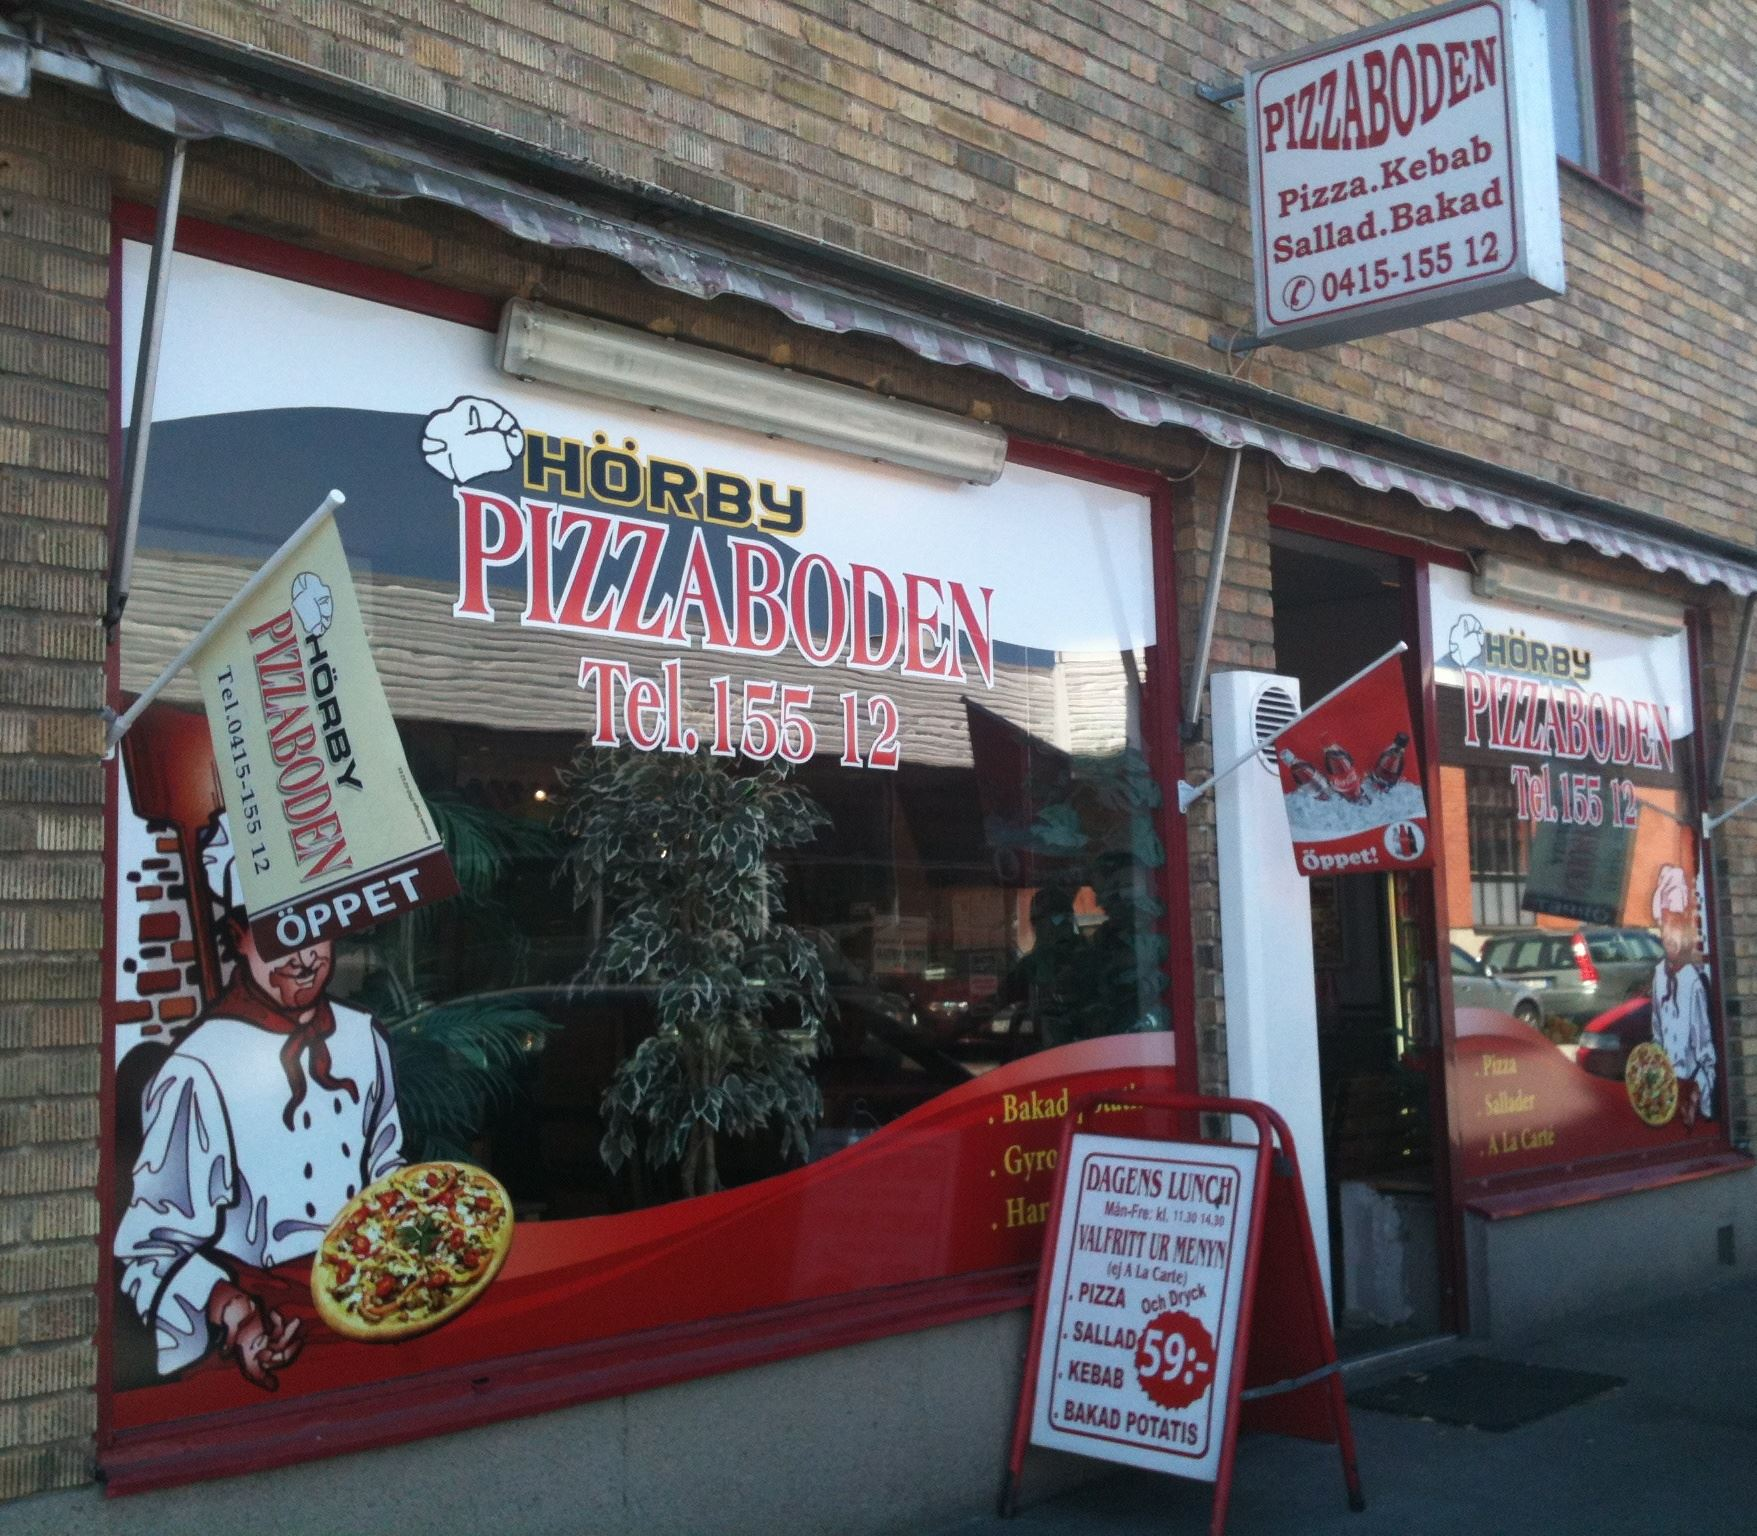 Turistbyrån, Pizzaboden